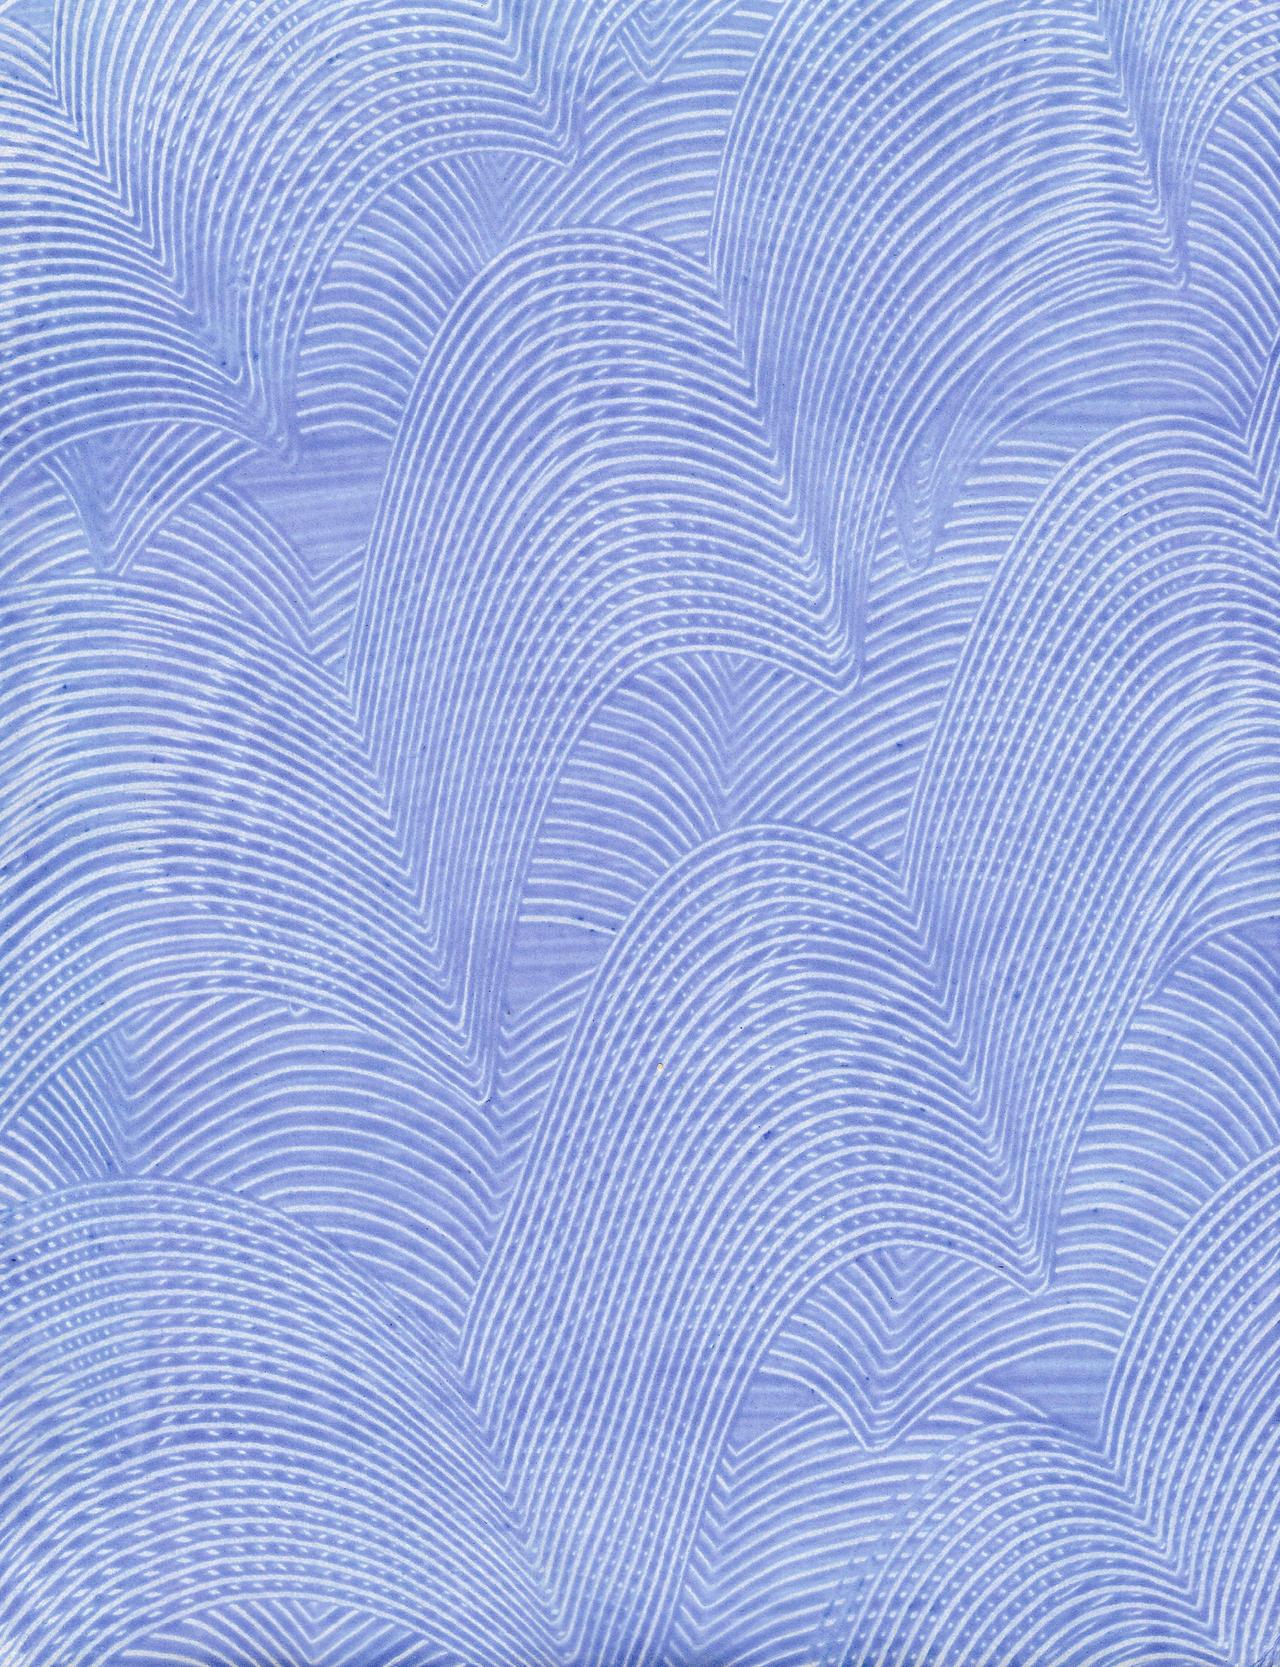 Wave Art Pattern Paper Texture